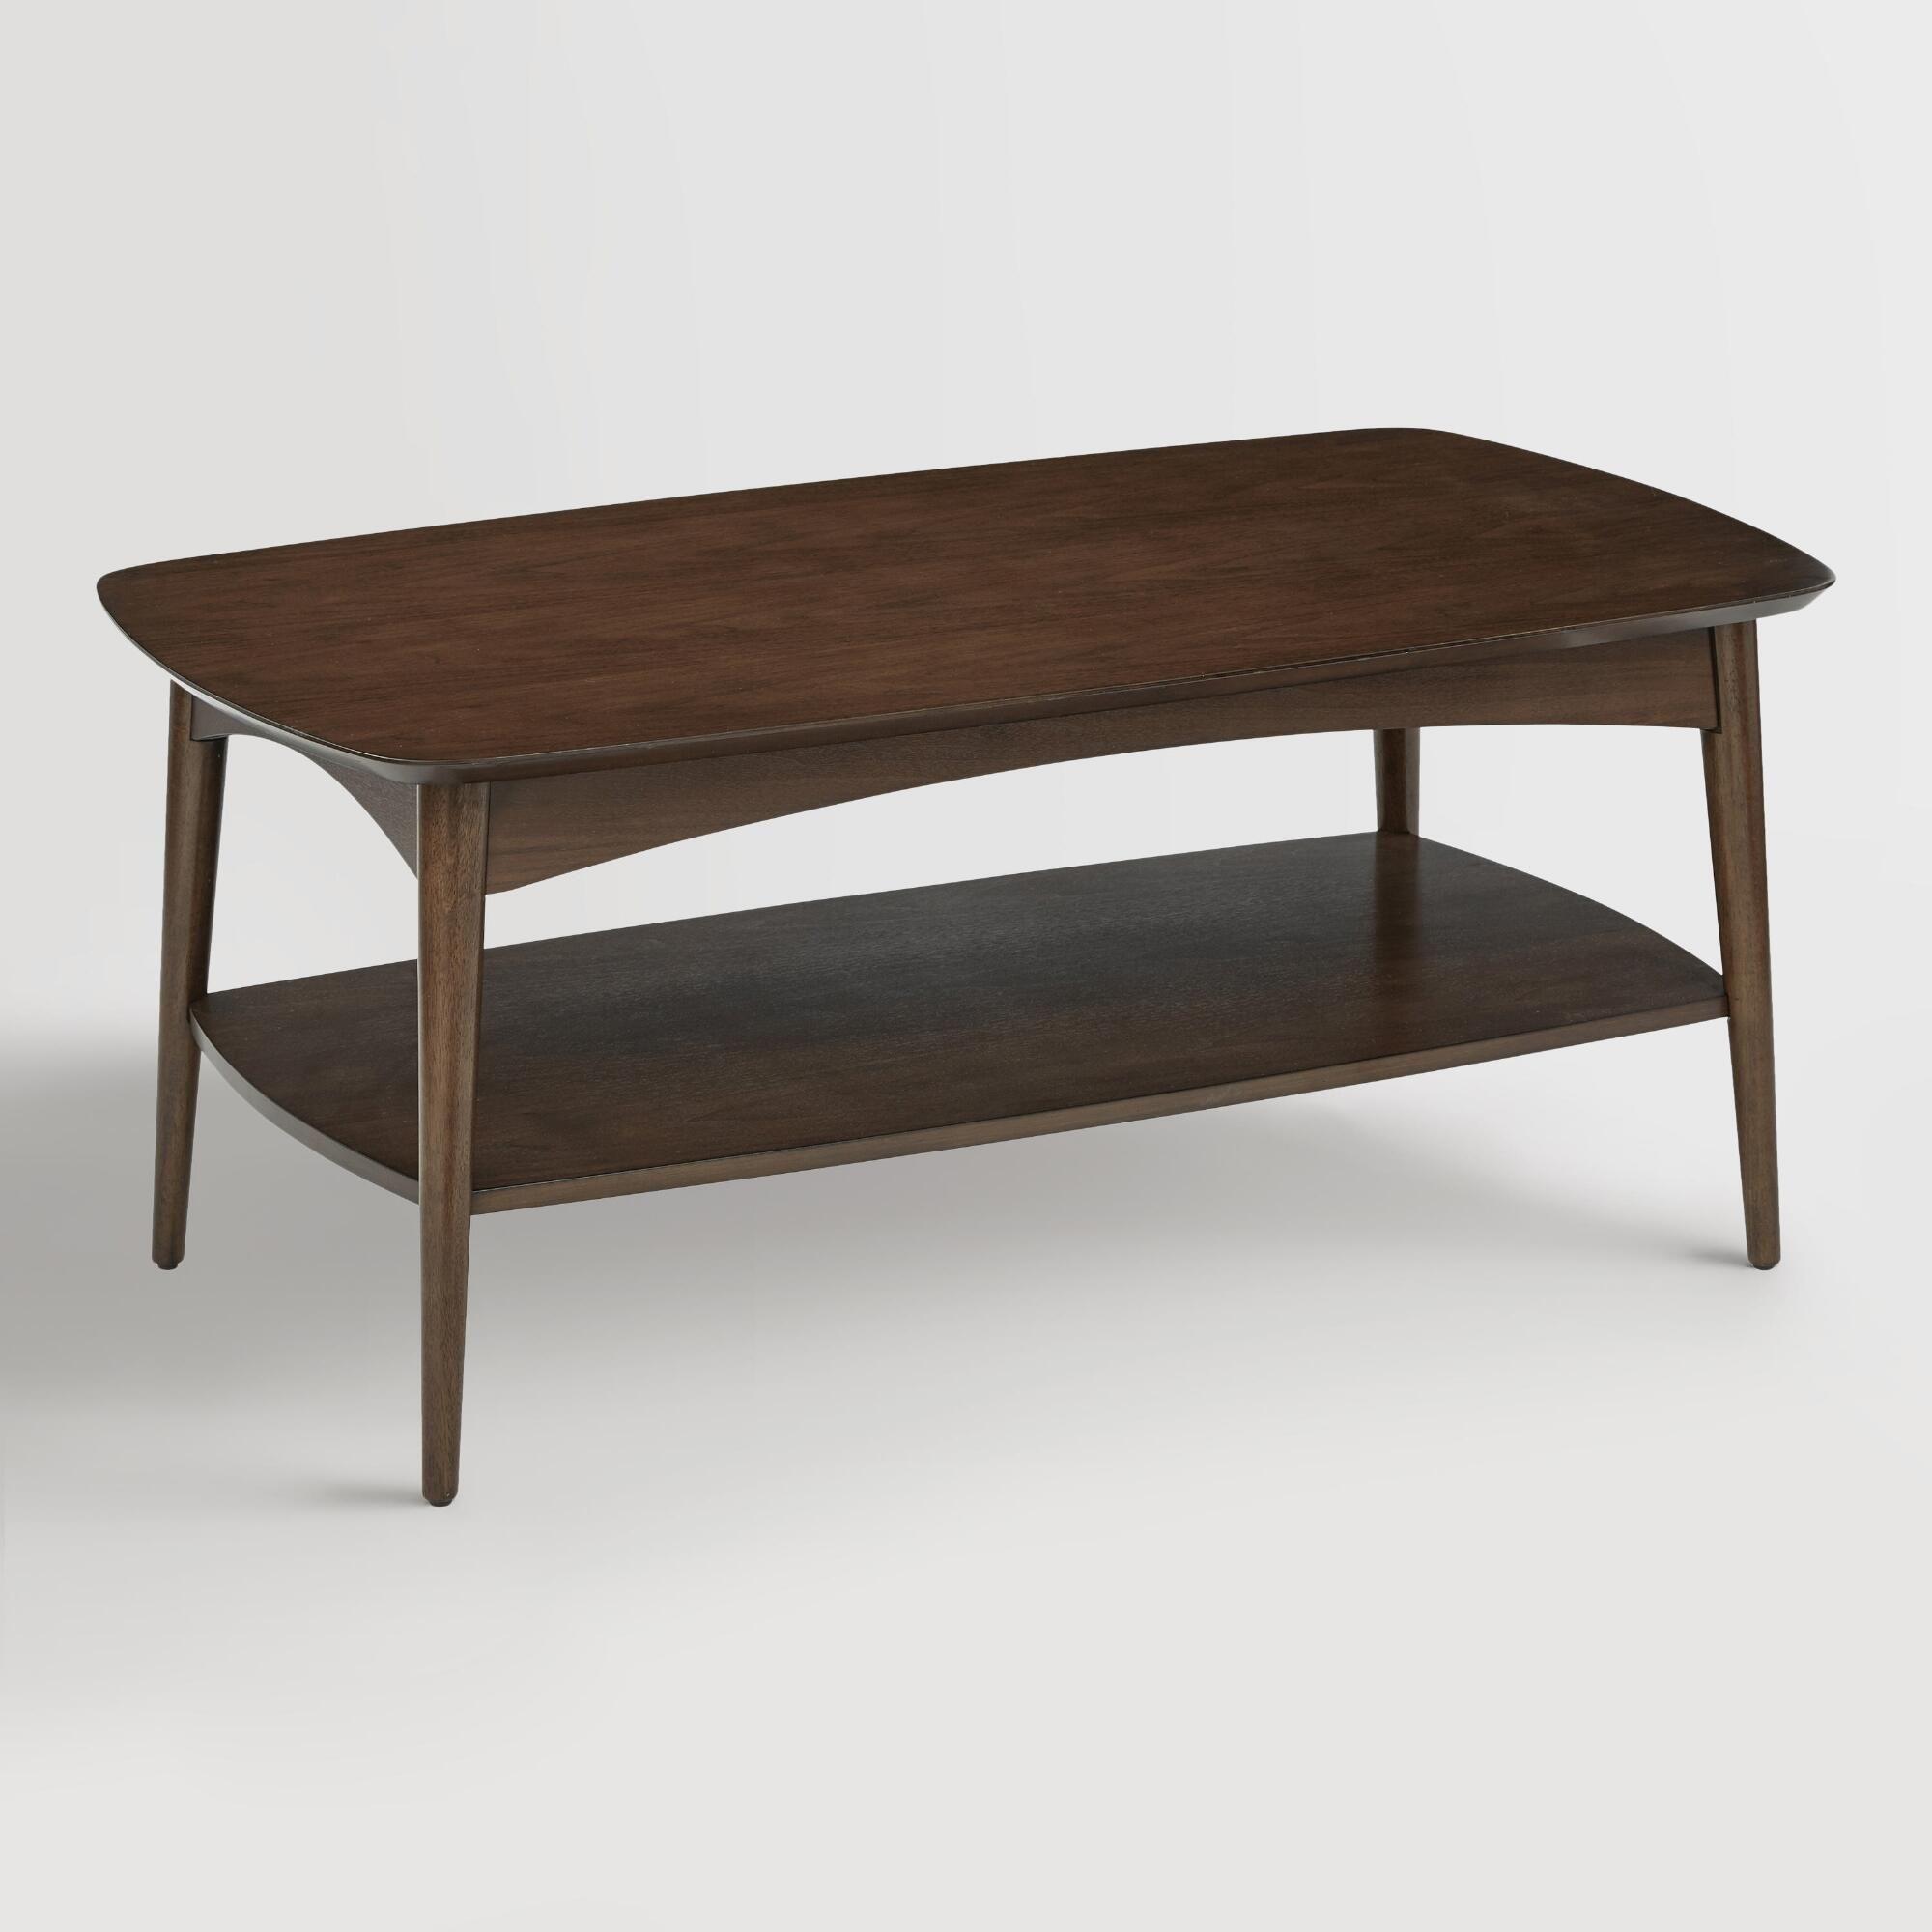 Walnut Brown Wood Brewston Coffee Table: Walnut Brown Wood Brewston Coffee Table By World Market In